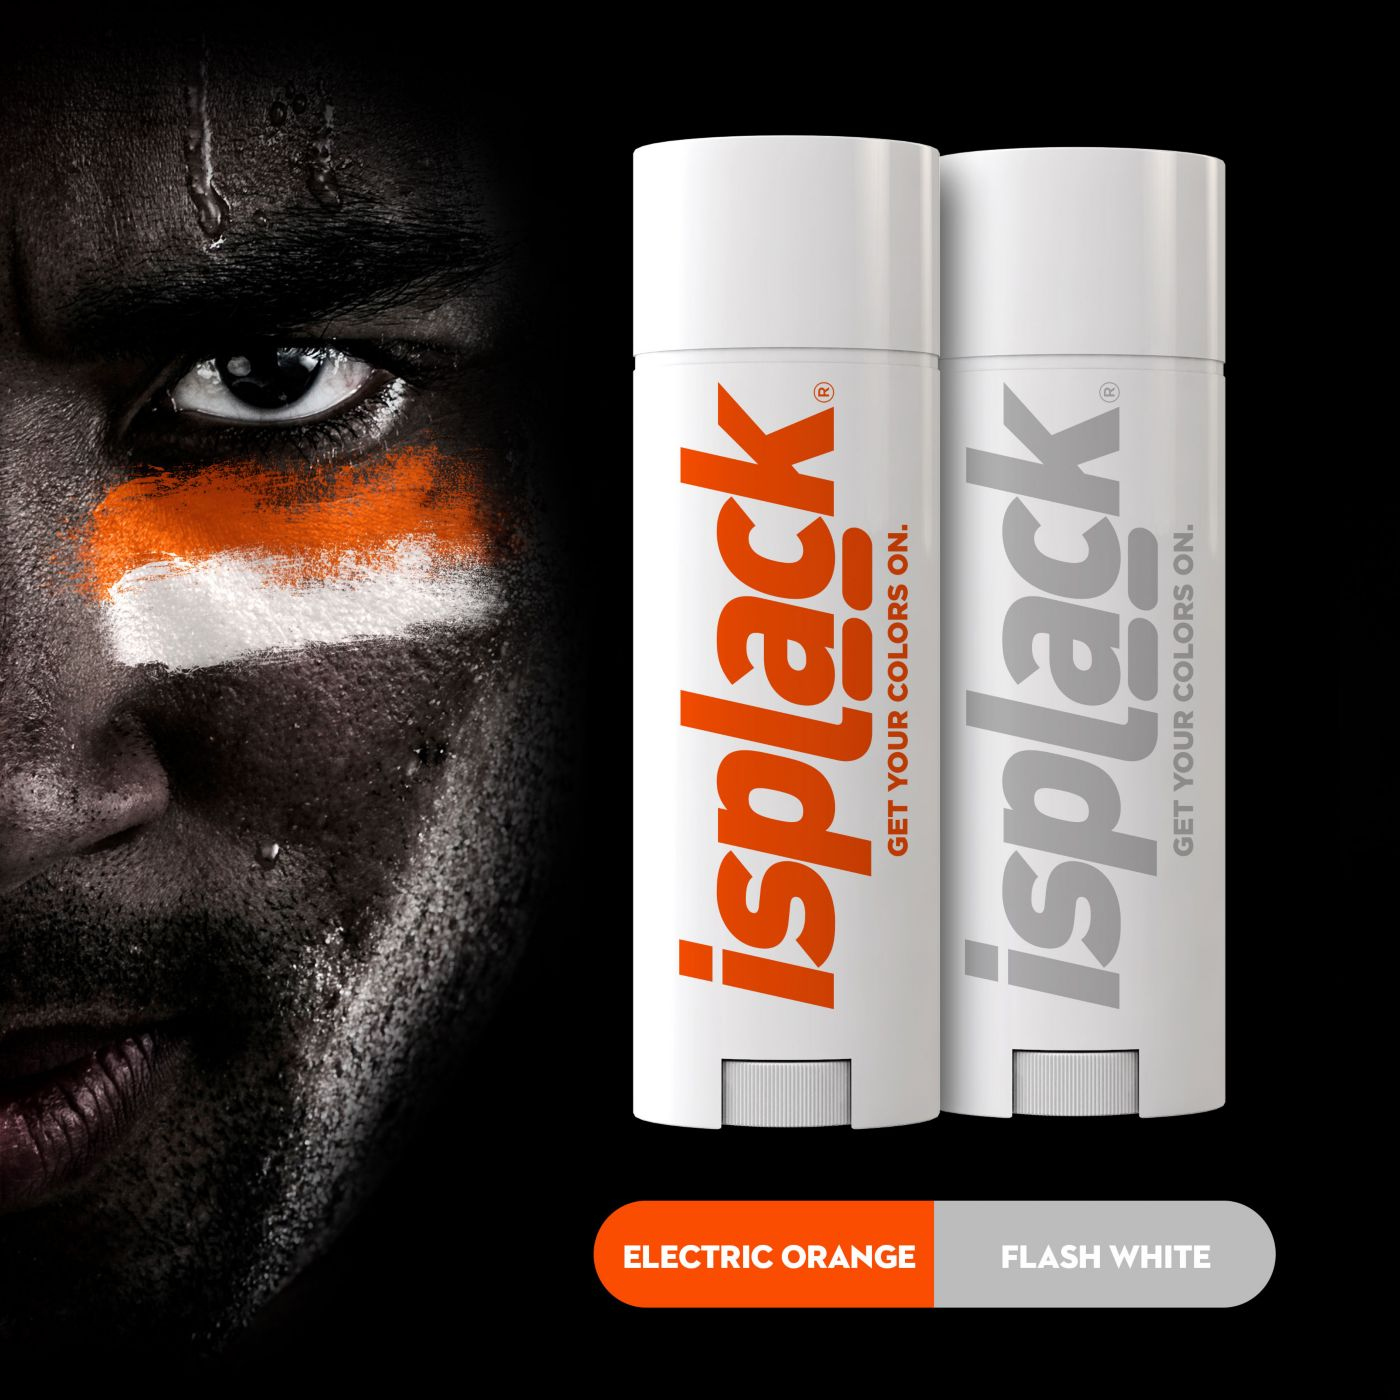 iSplack Colored Eyeblack - Two-Pack